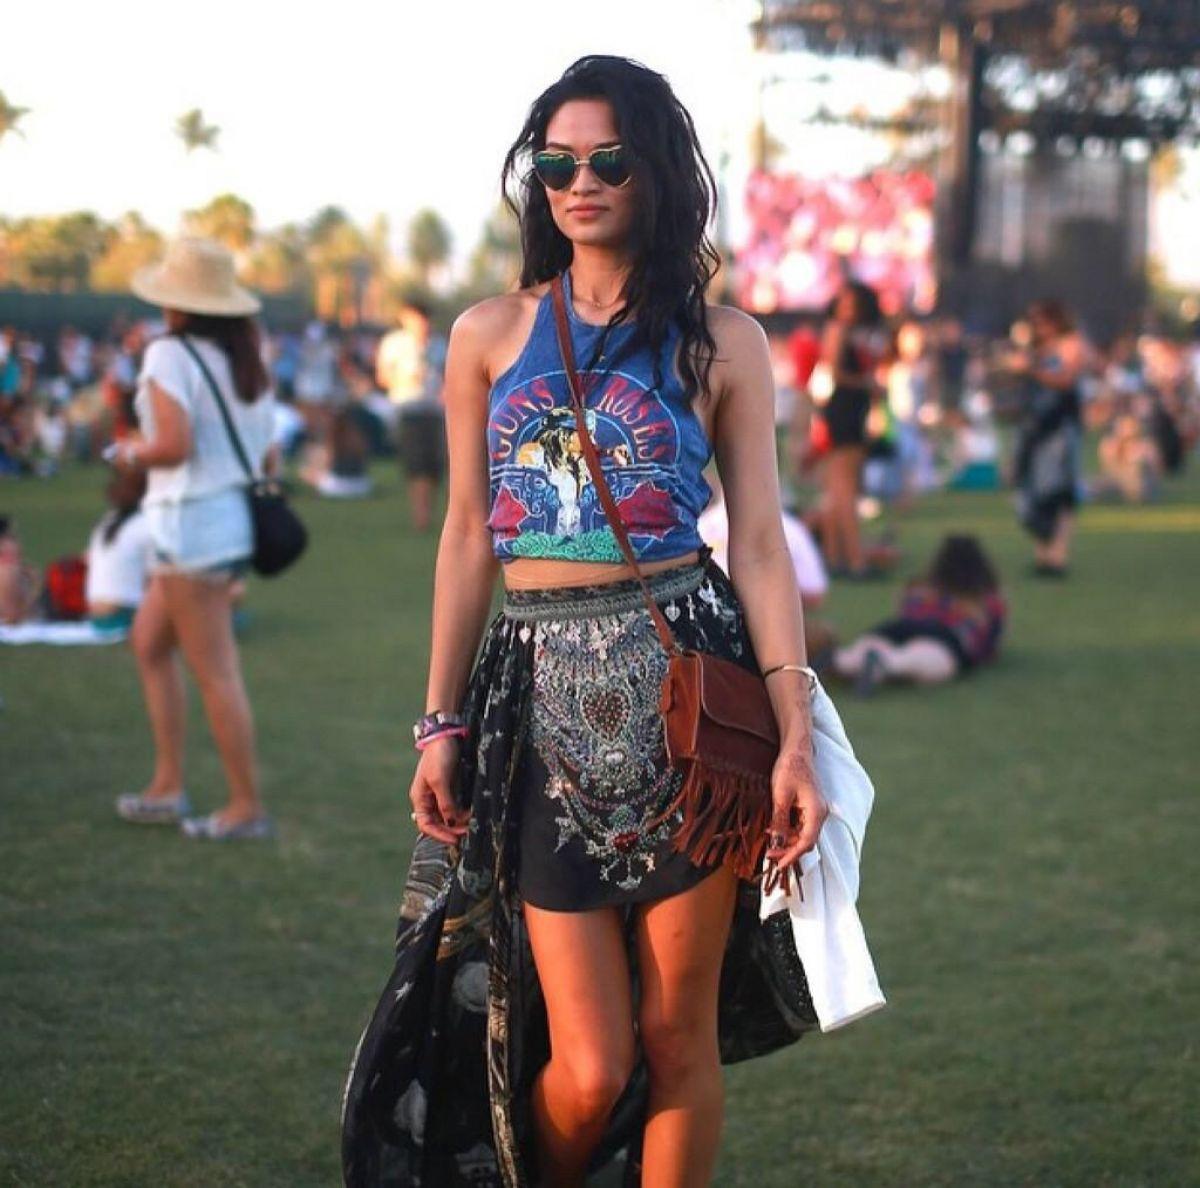 SHANIN SHAIK at 2015 Coachella Music Festival